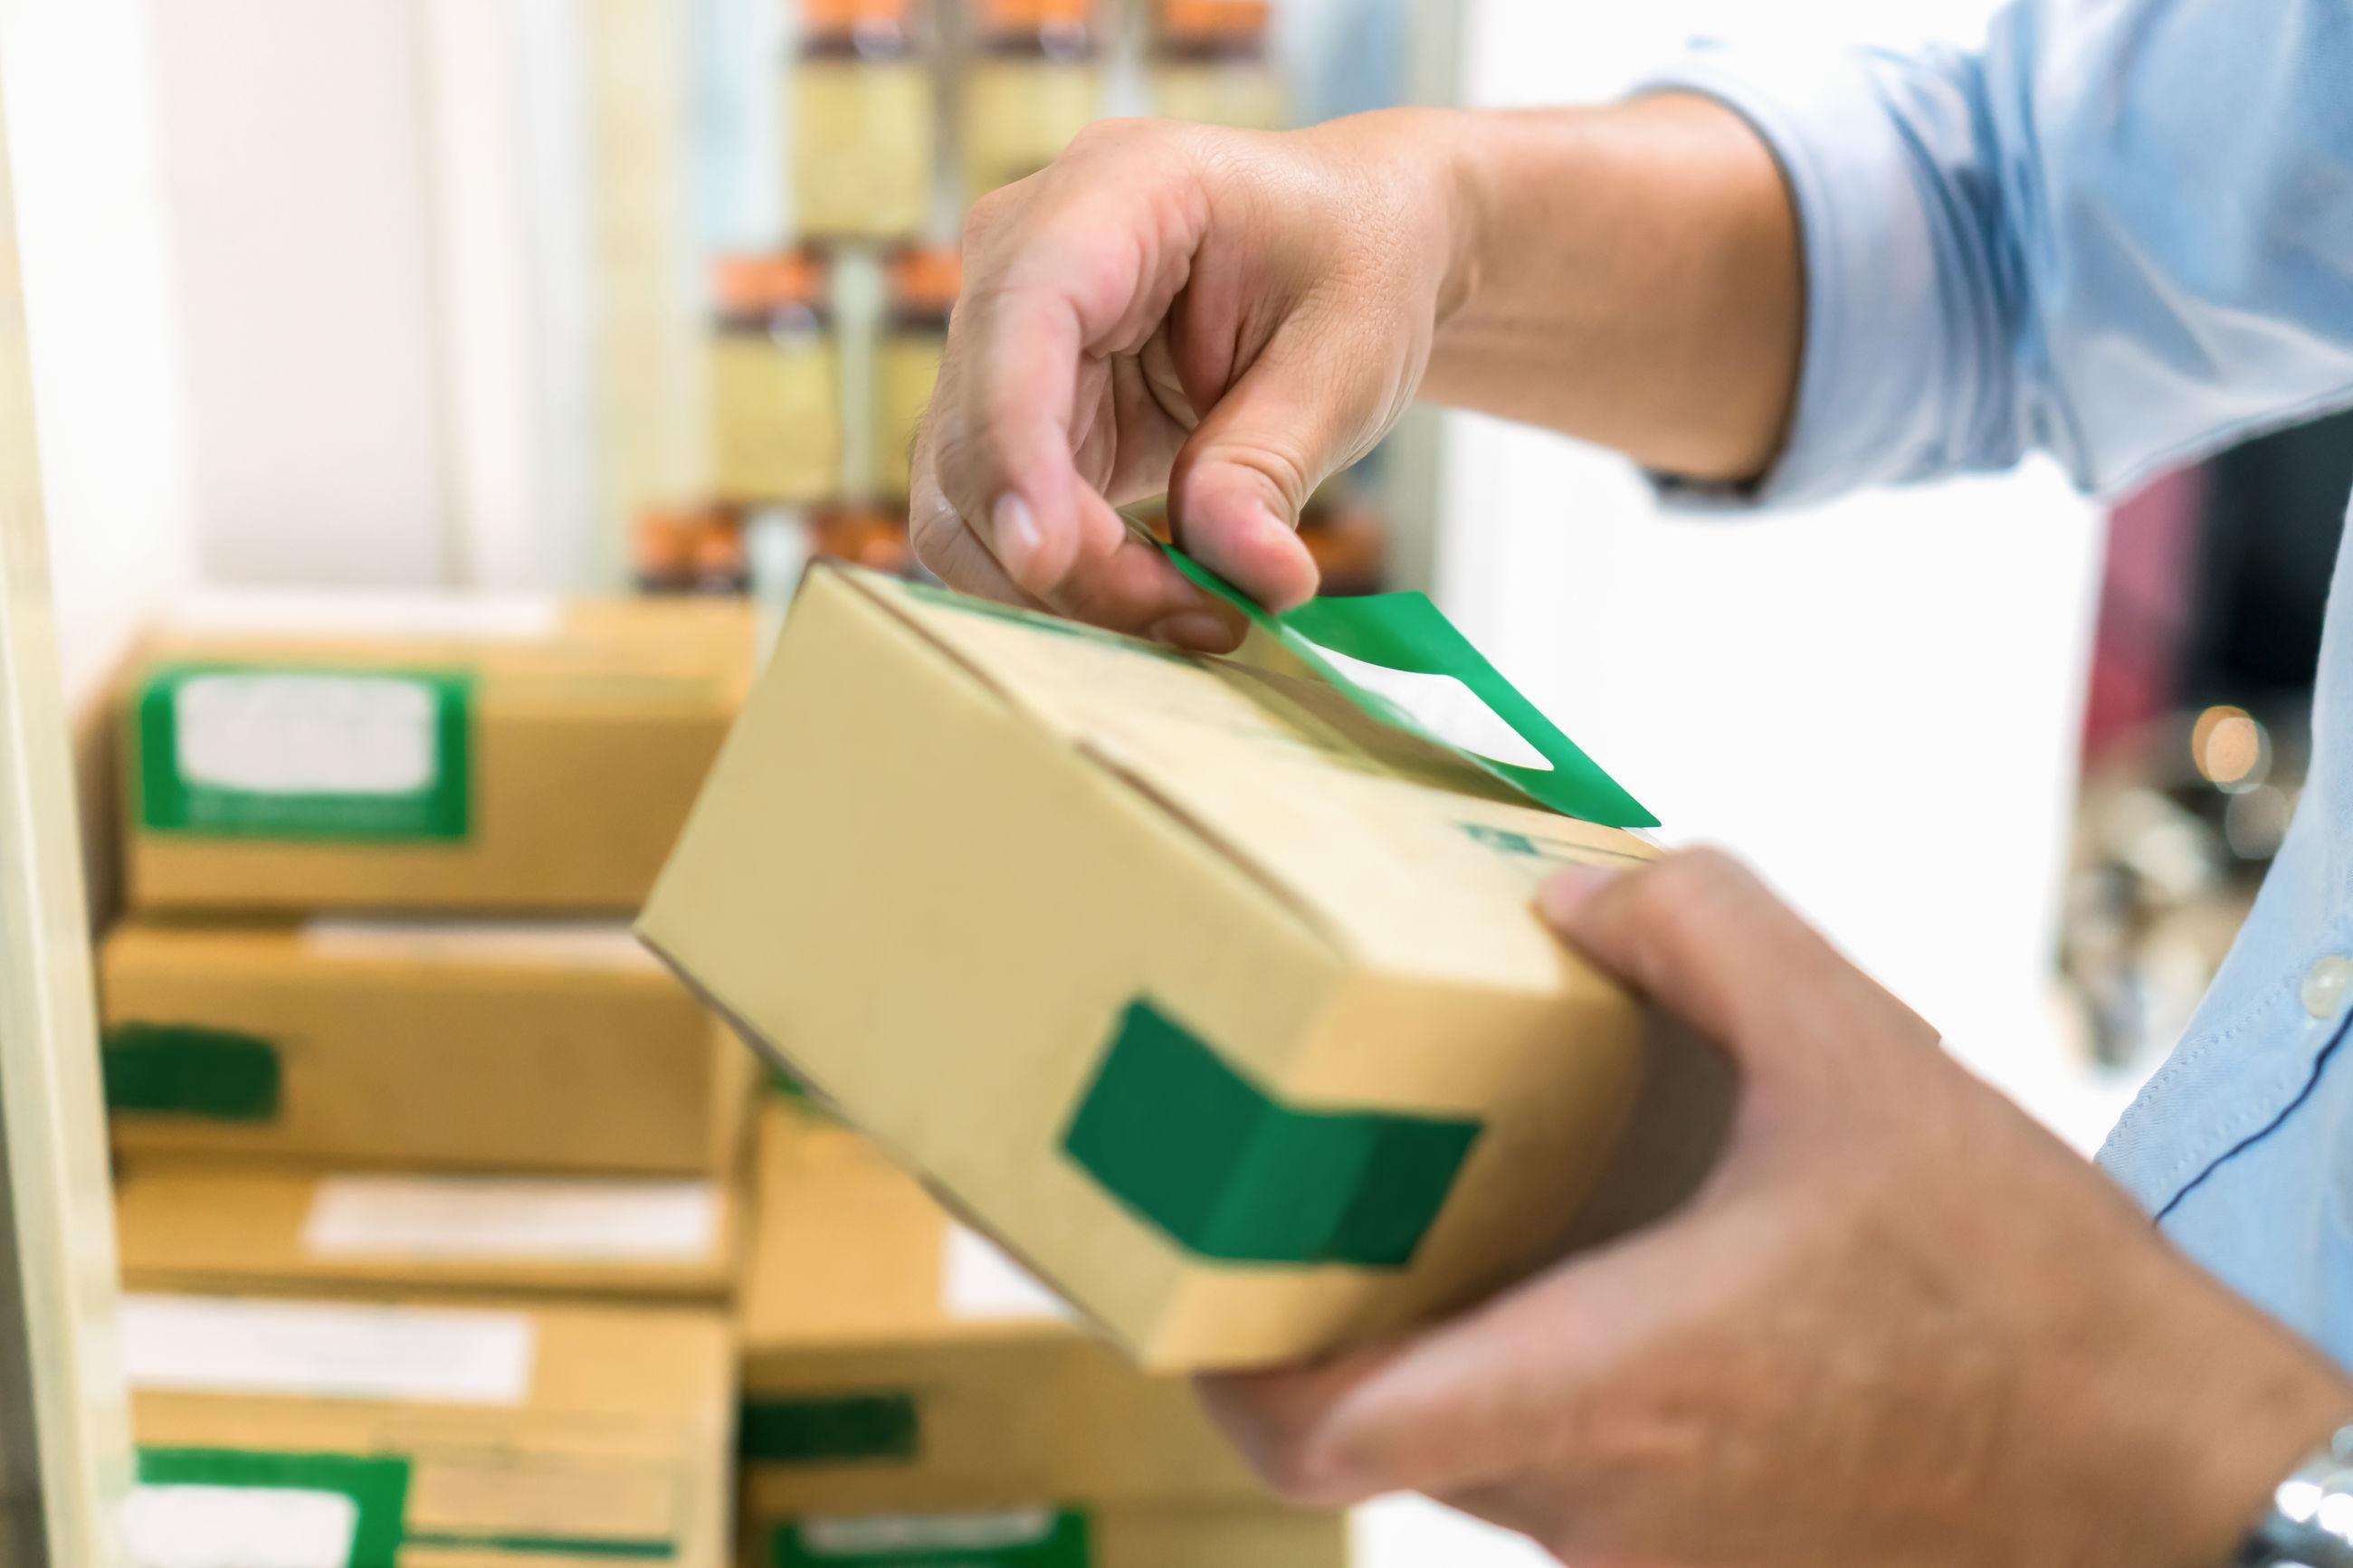 Cropped hands of man sticking labels on cardboard boxes at workshop